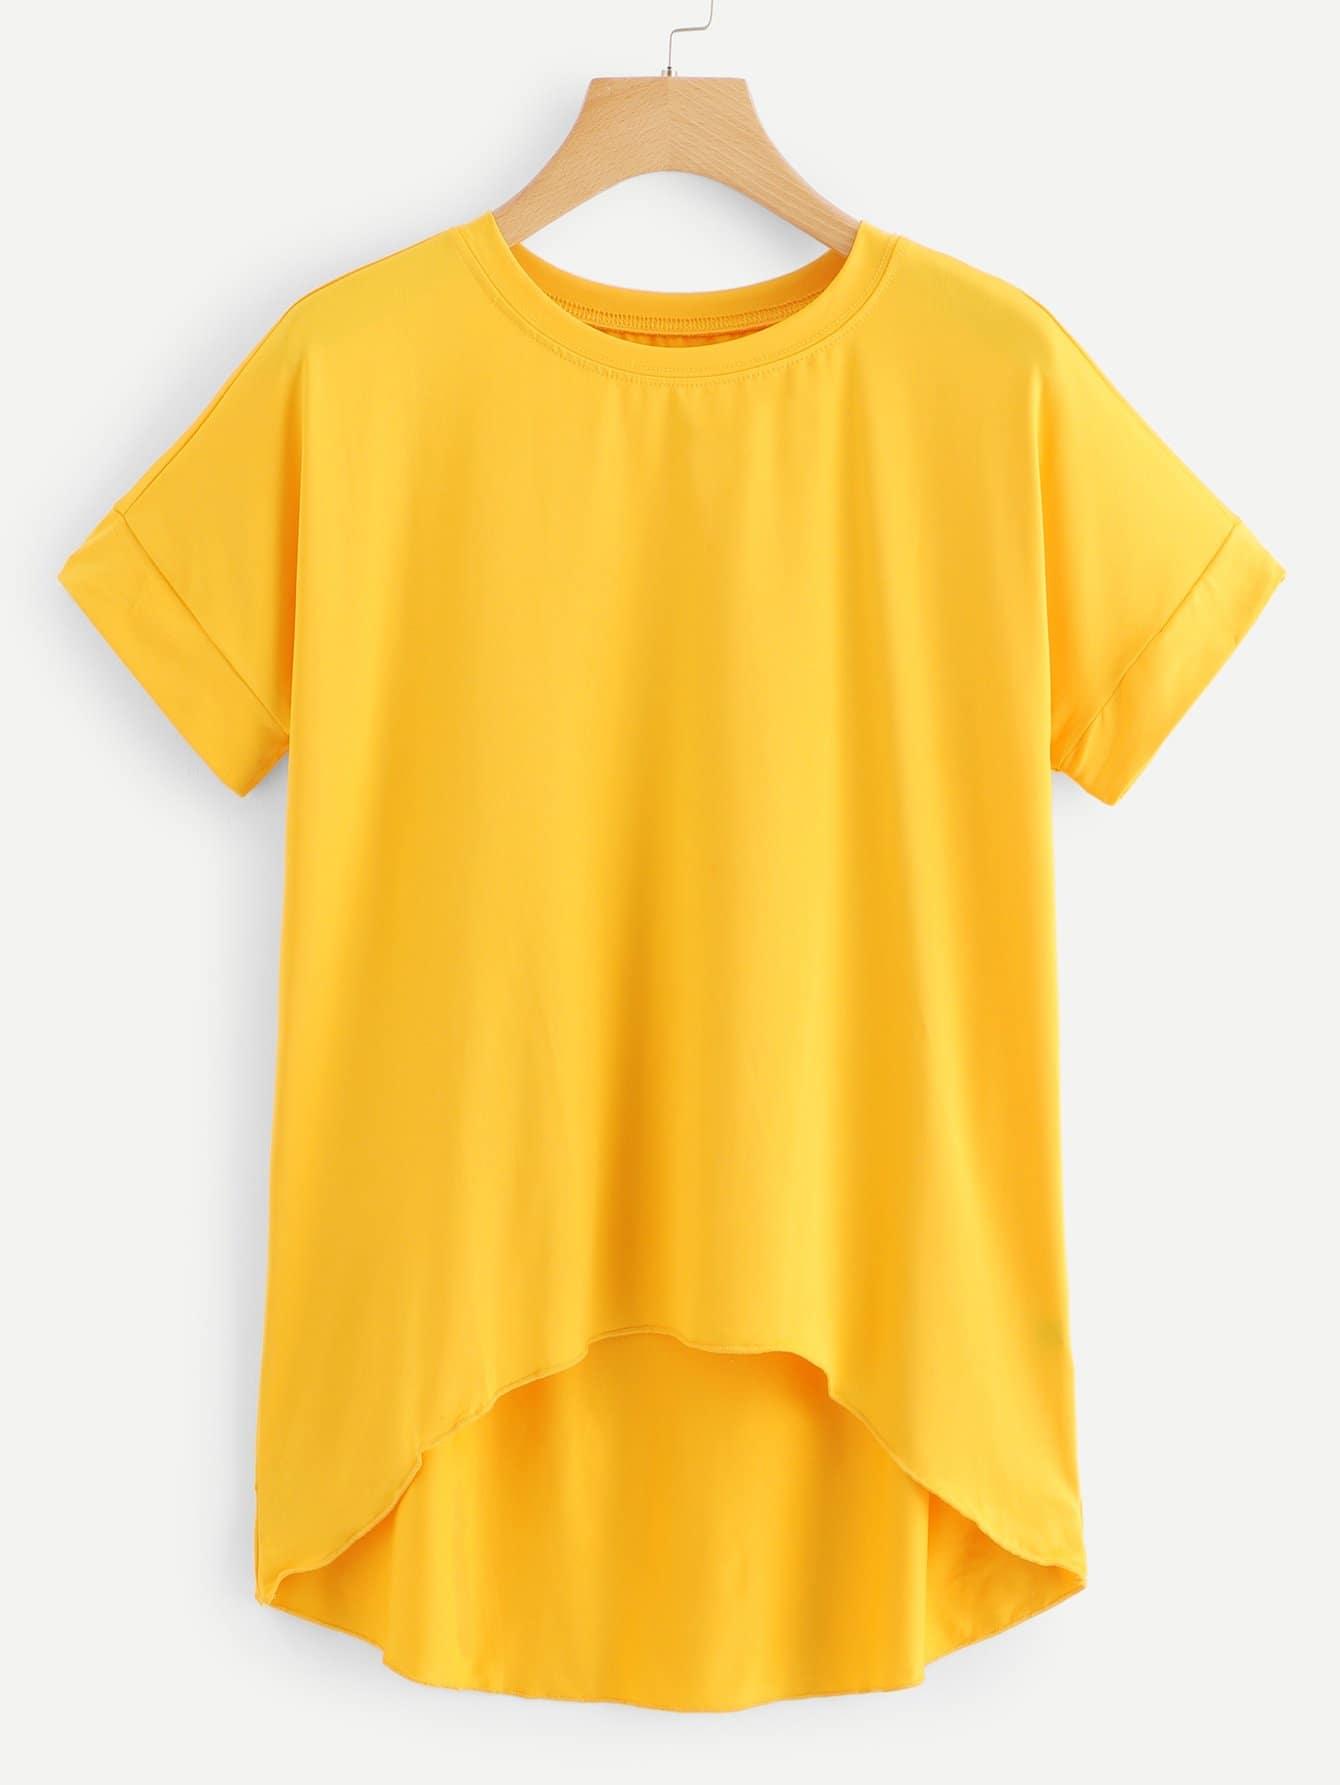 Купить Модная асимметричная футболка, null, SheIn